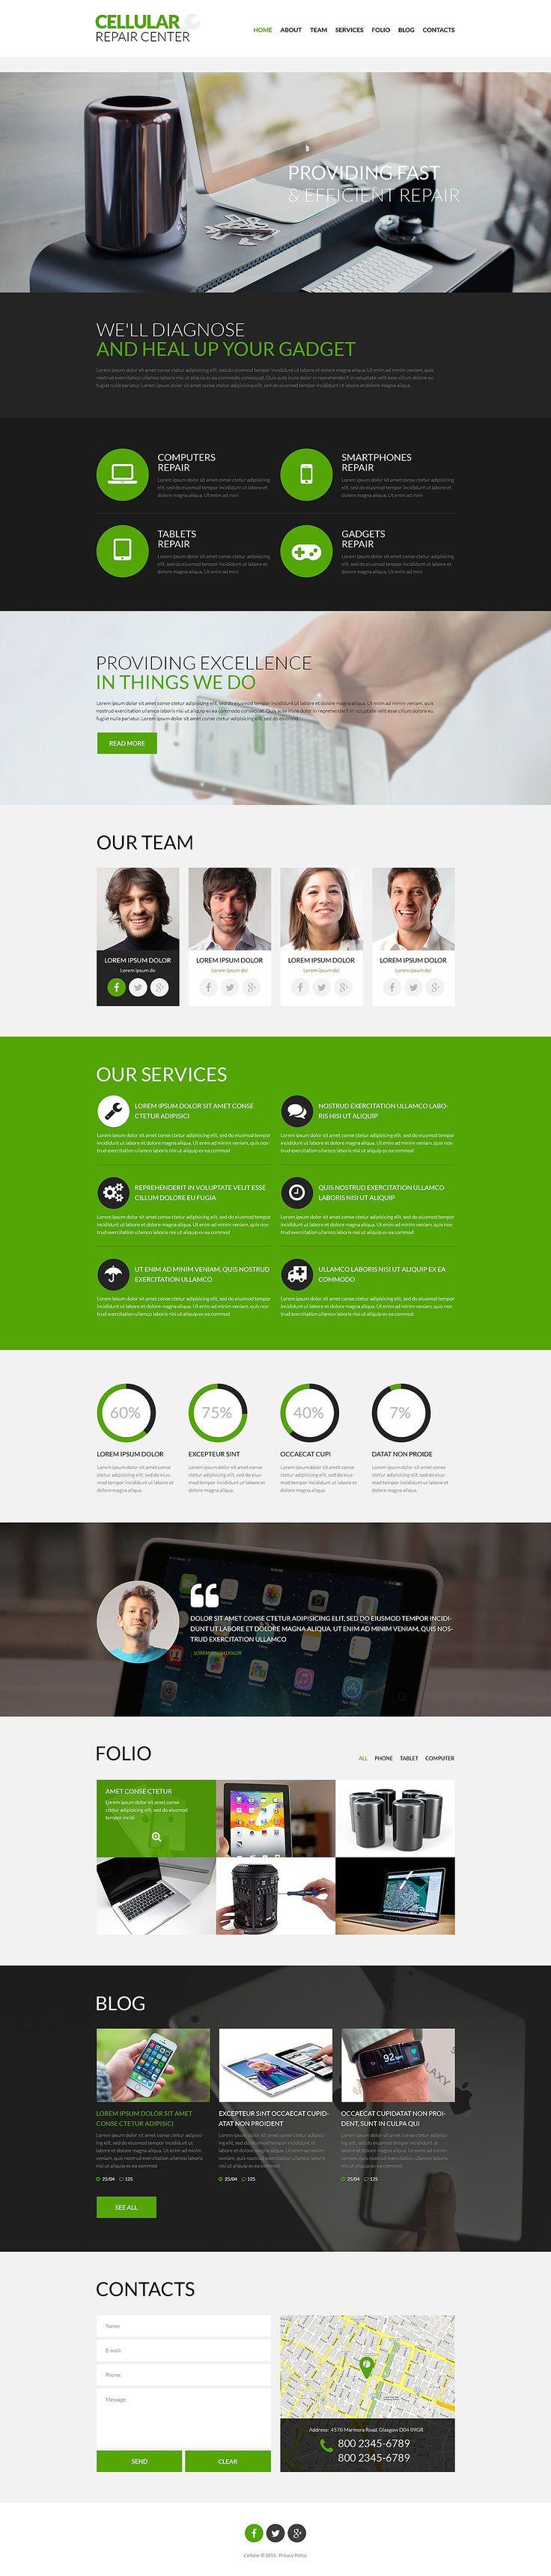 Cellular Repair Center WordPress Theme